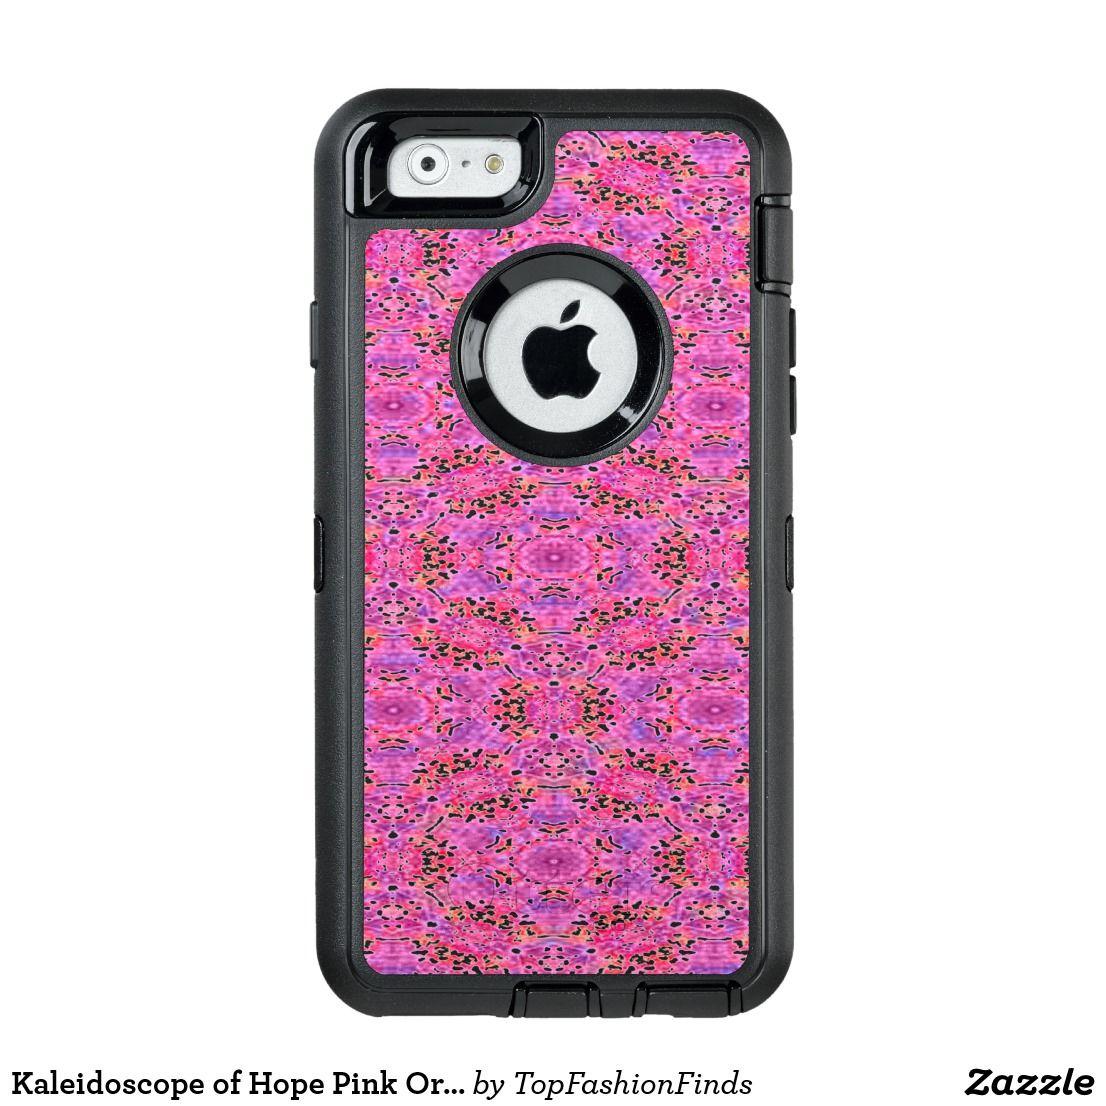 Kaleidoscope of Hope Pink Orange Purple OtterBox iPhone